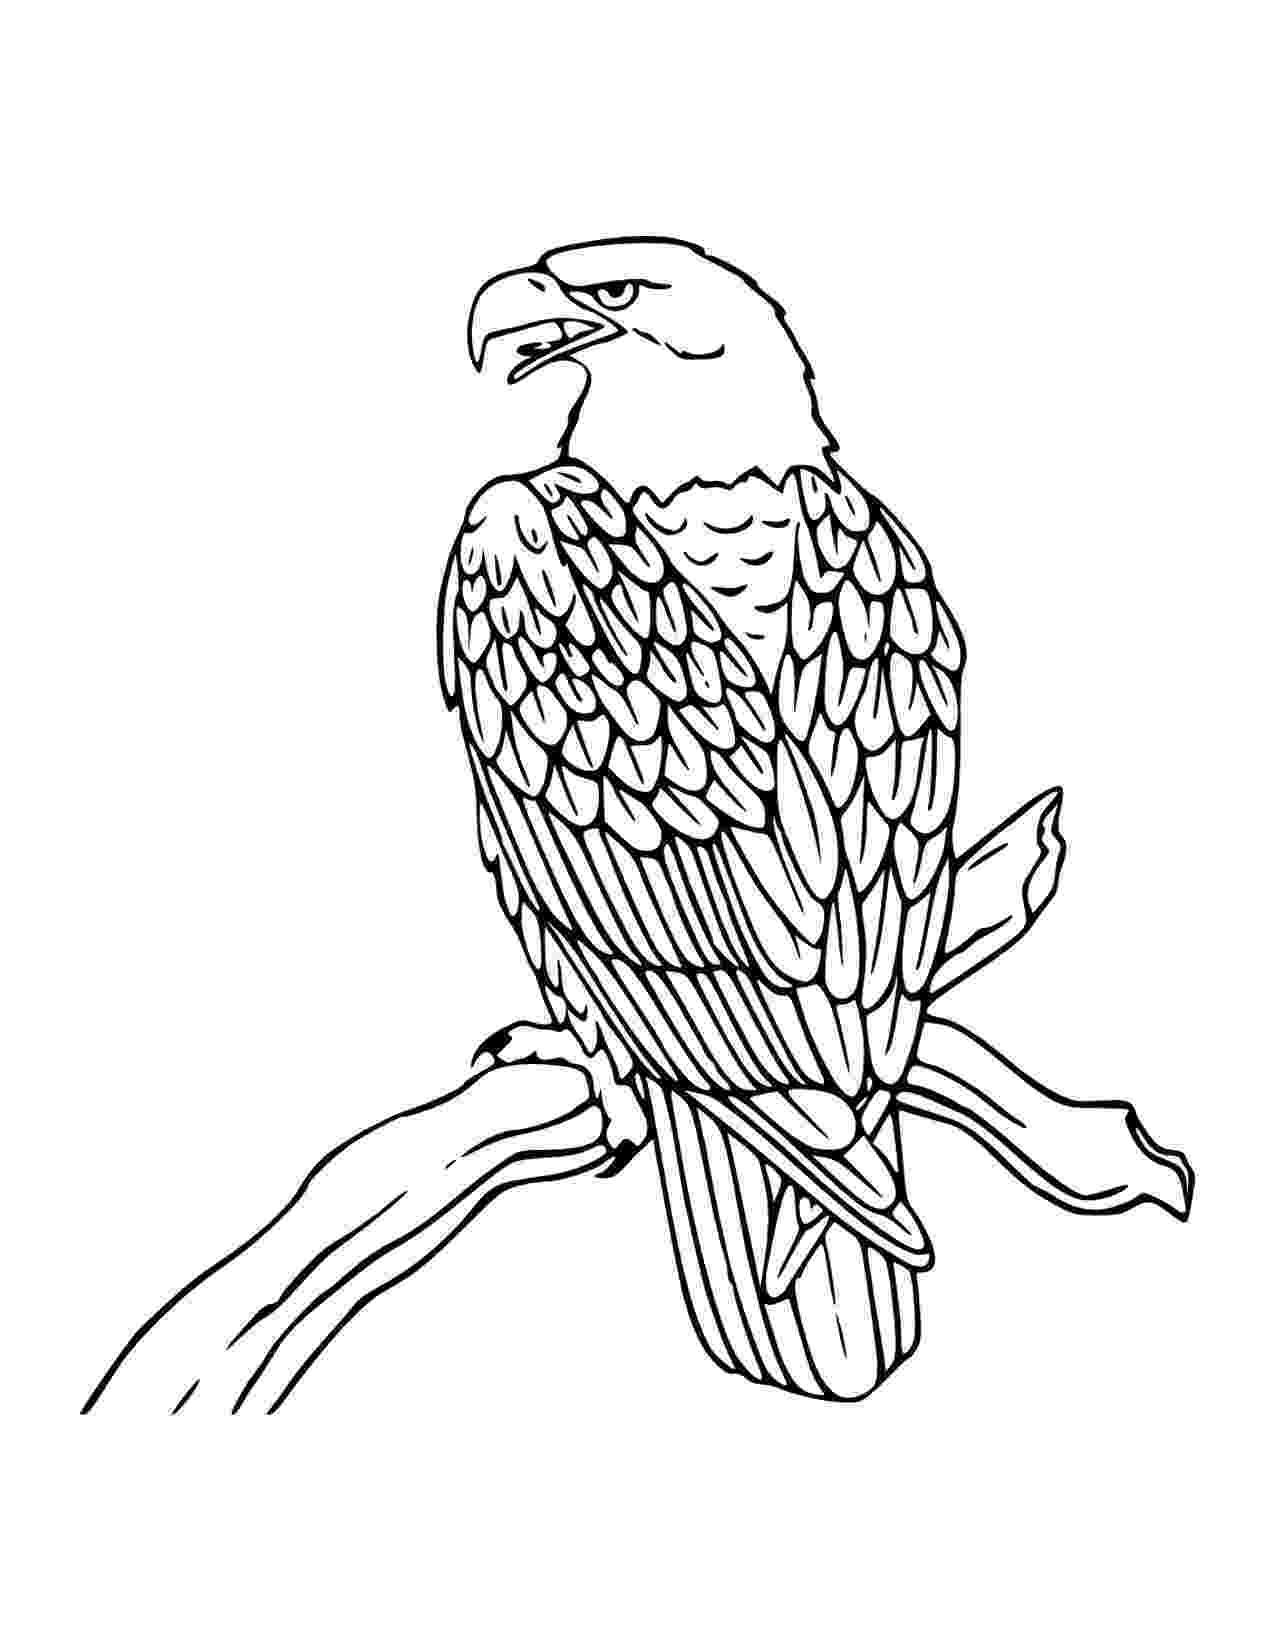 free printable pictures of eagles eagle bird coloring pages to printable of eagles free pictures printable